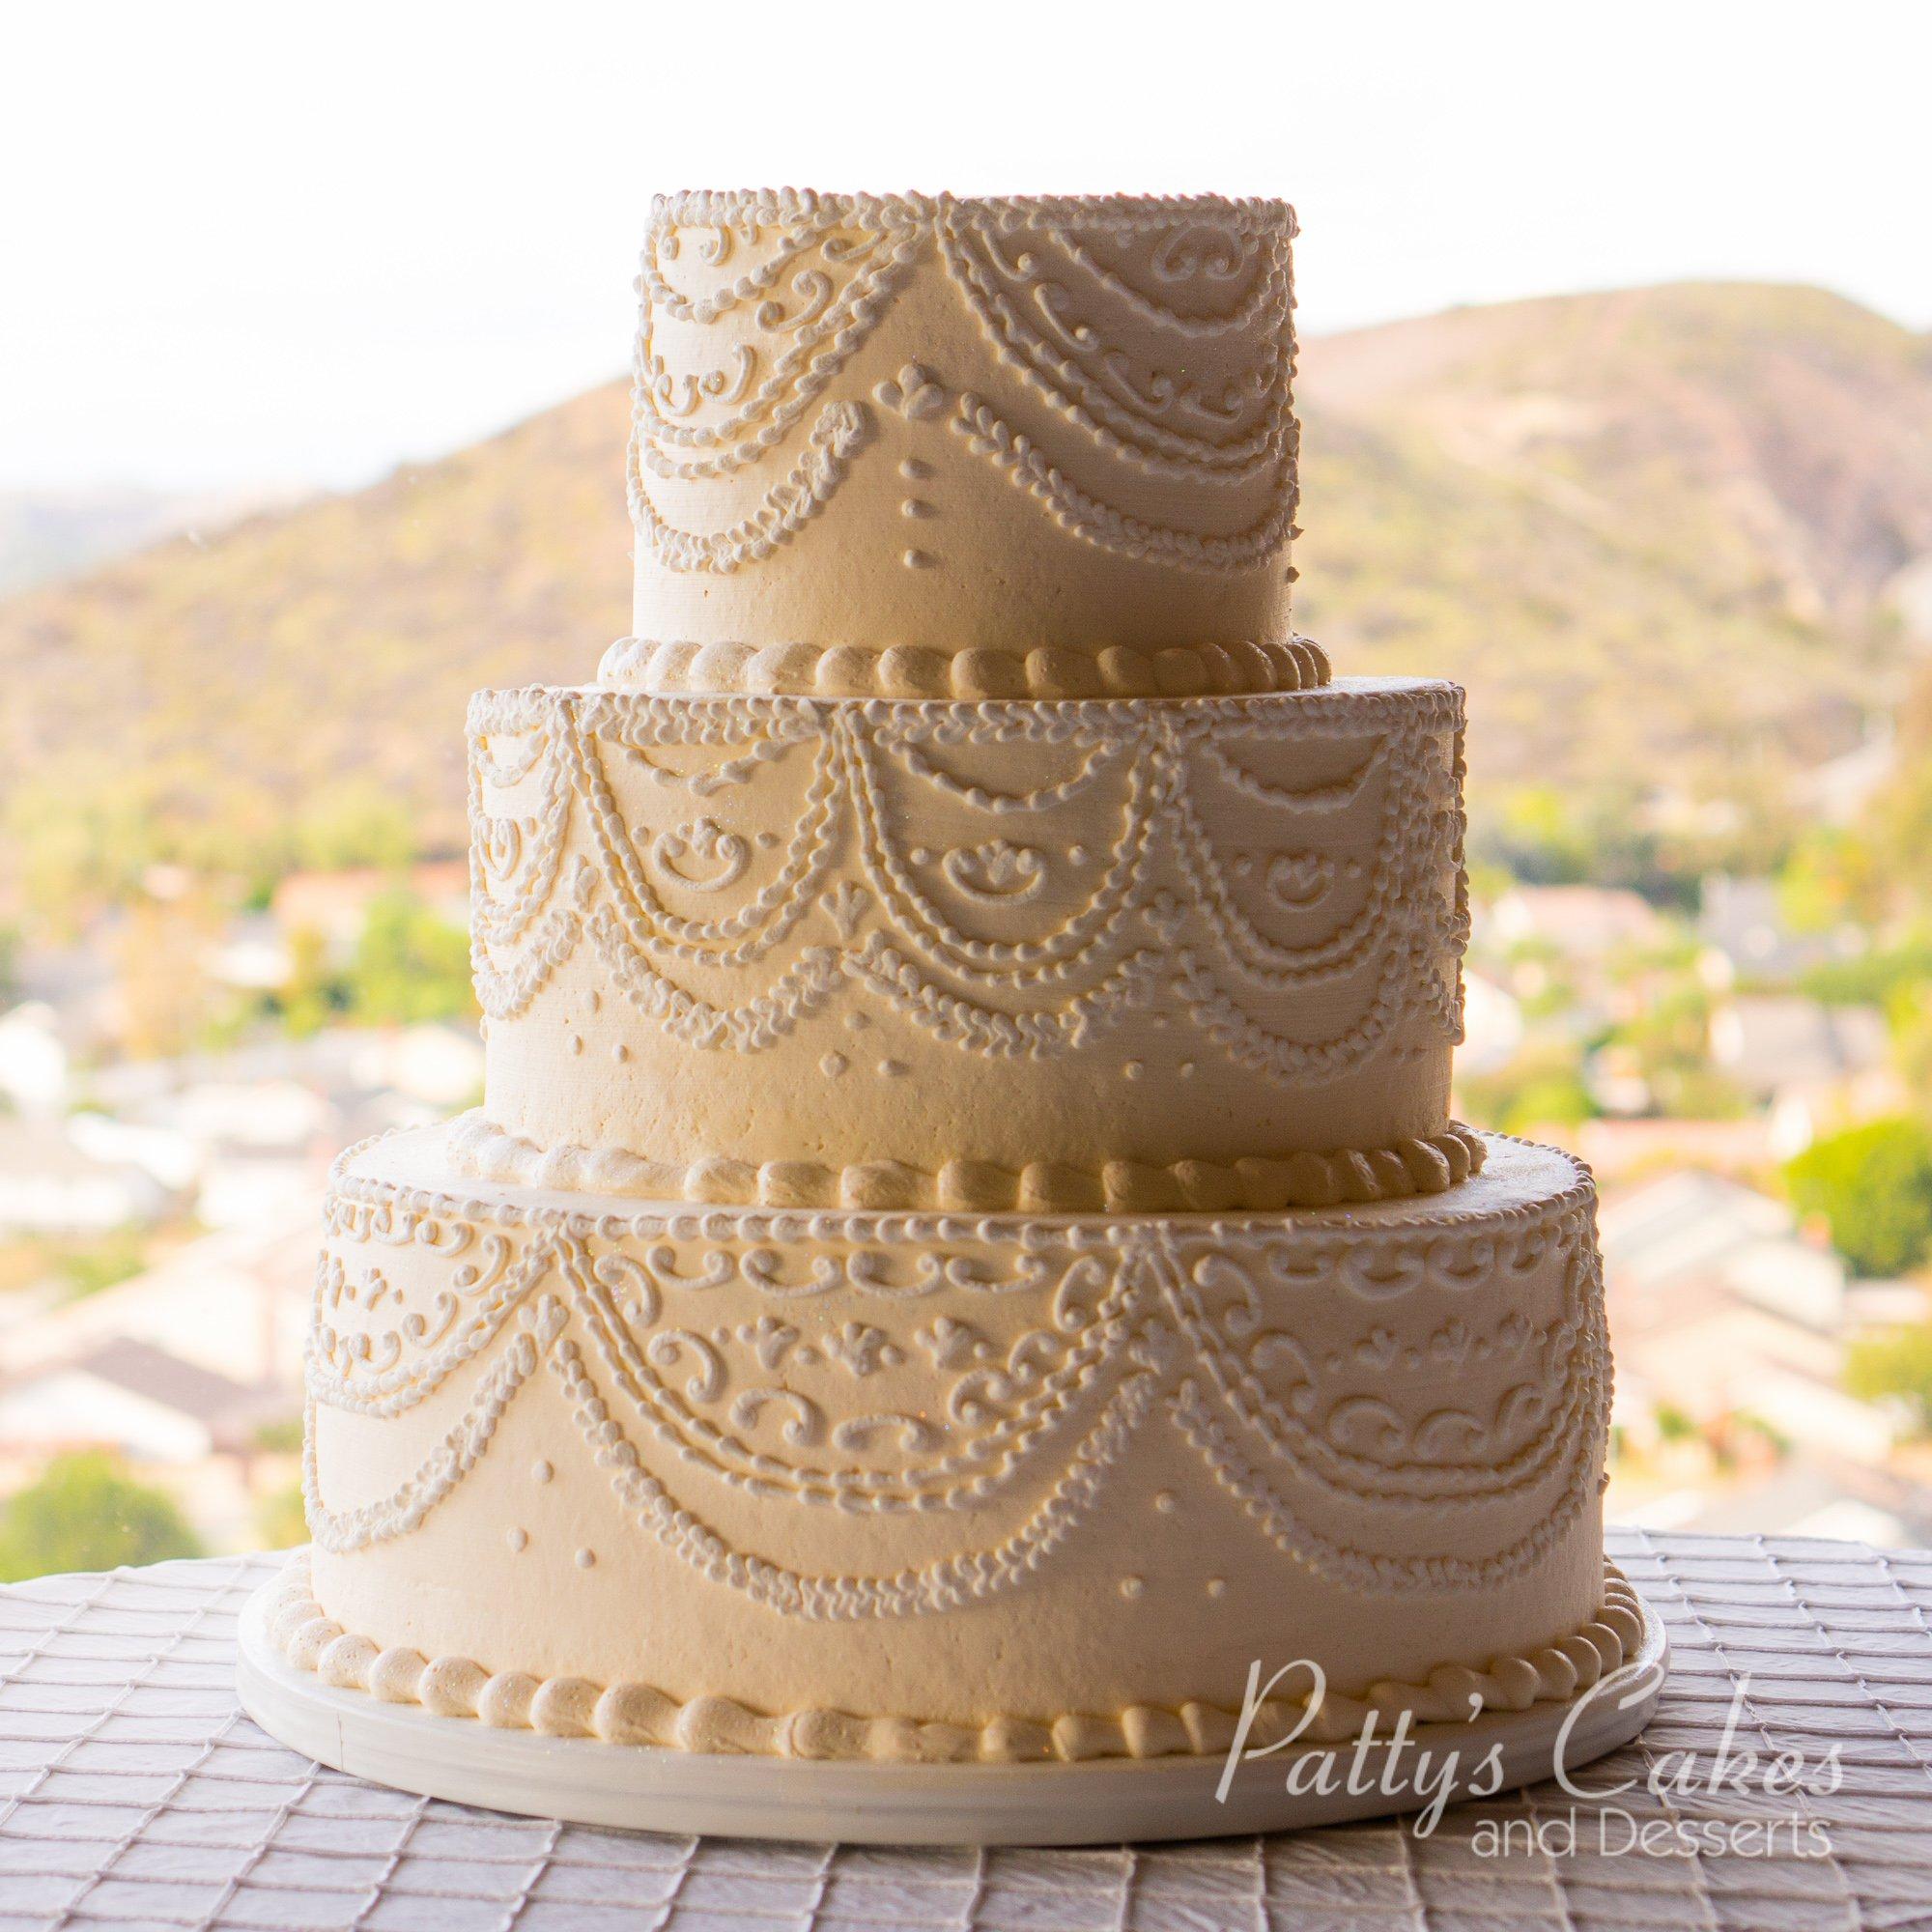 Wedding Cake Photos: Photo Of A Off White Wedding Cake